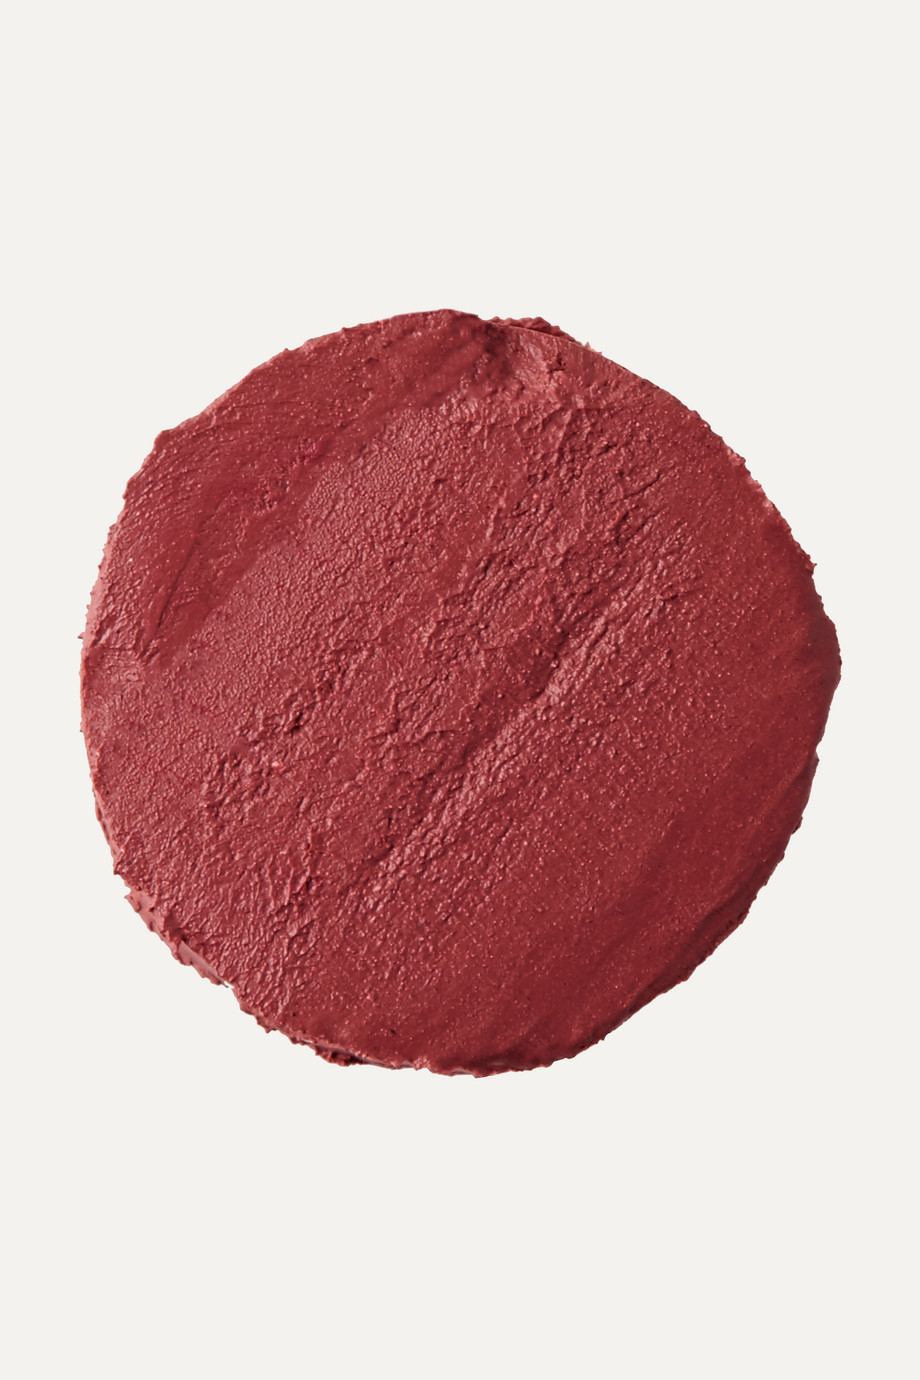 RMS Beauty Wild With Desire Lipstick – Temptation – Lippenstift